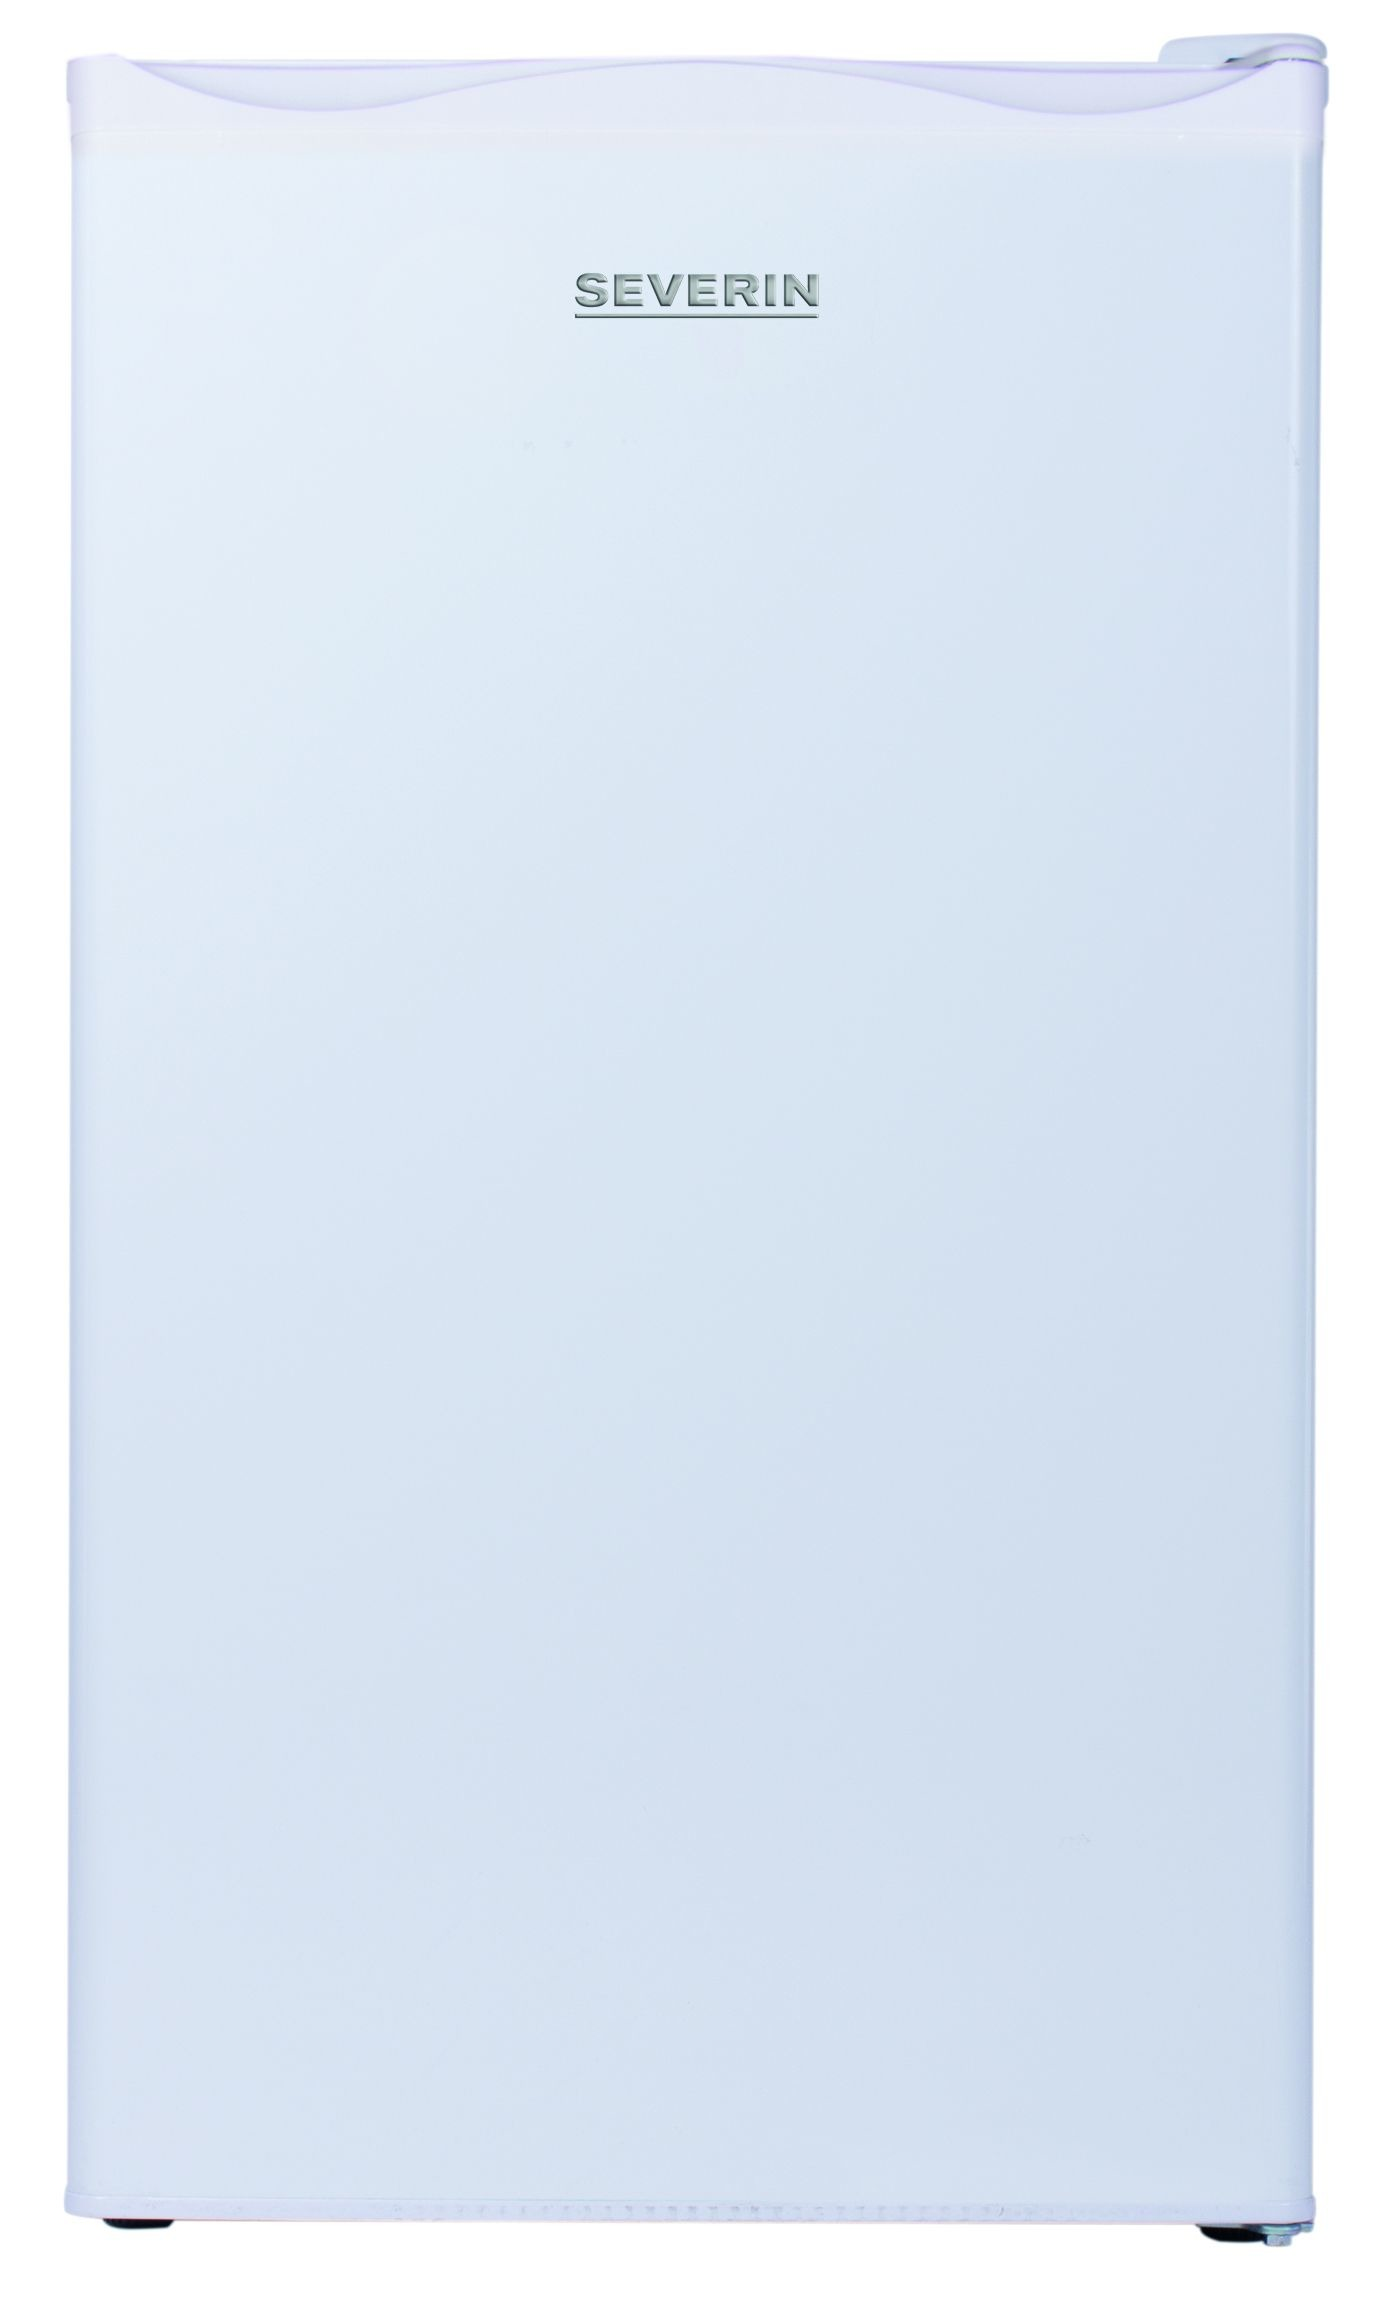 Korting Severin VKS8805 minikoelkast